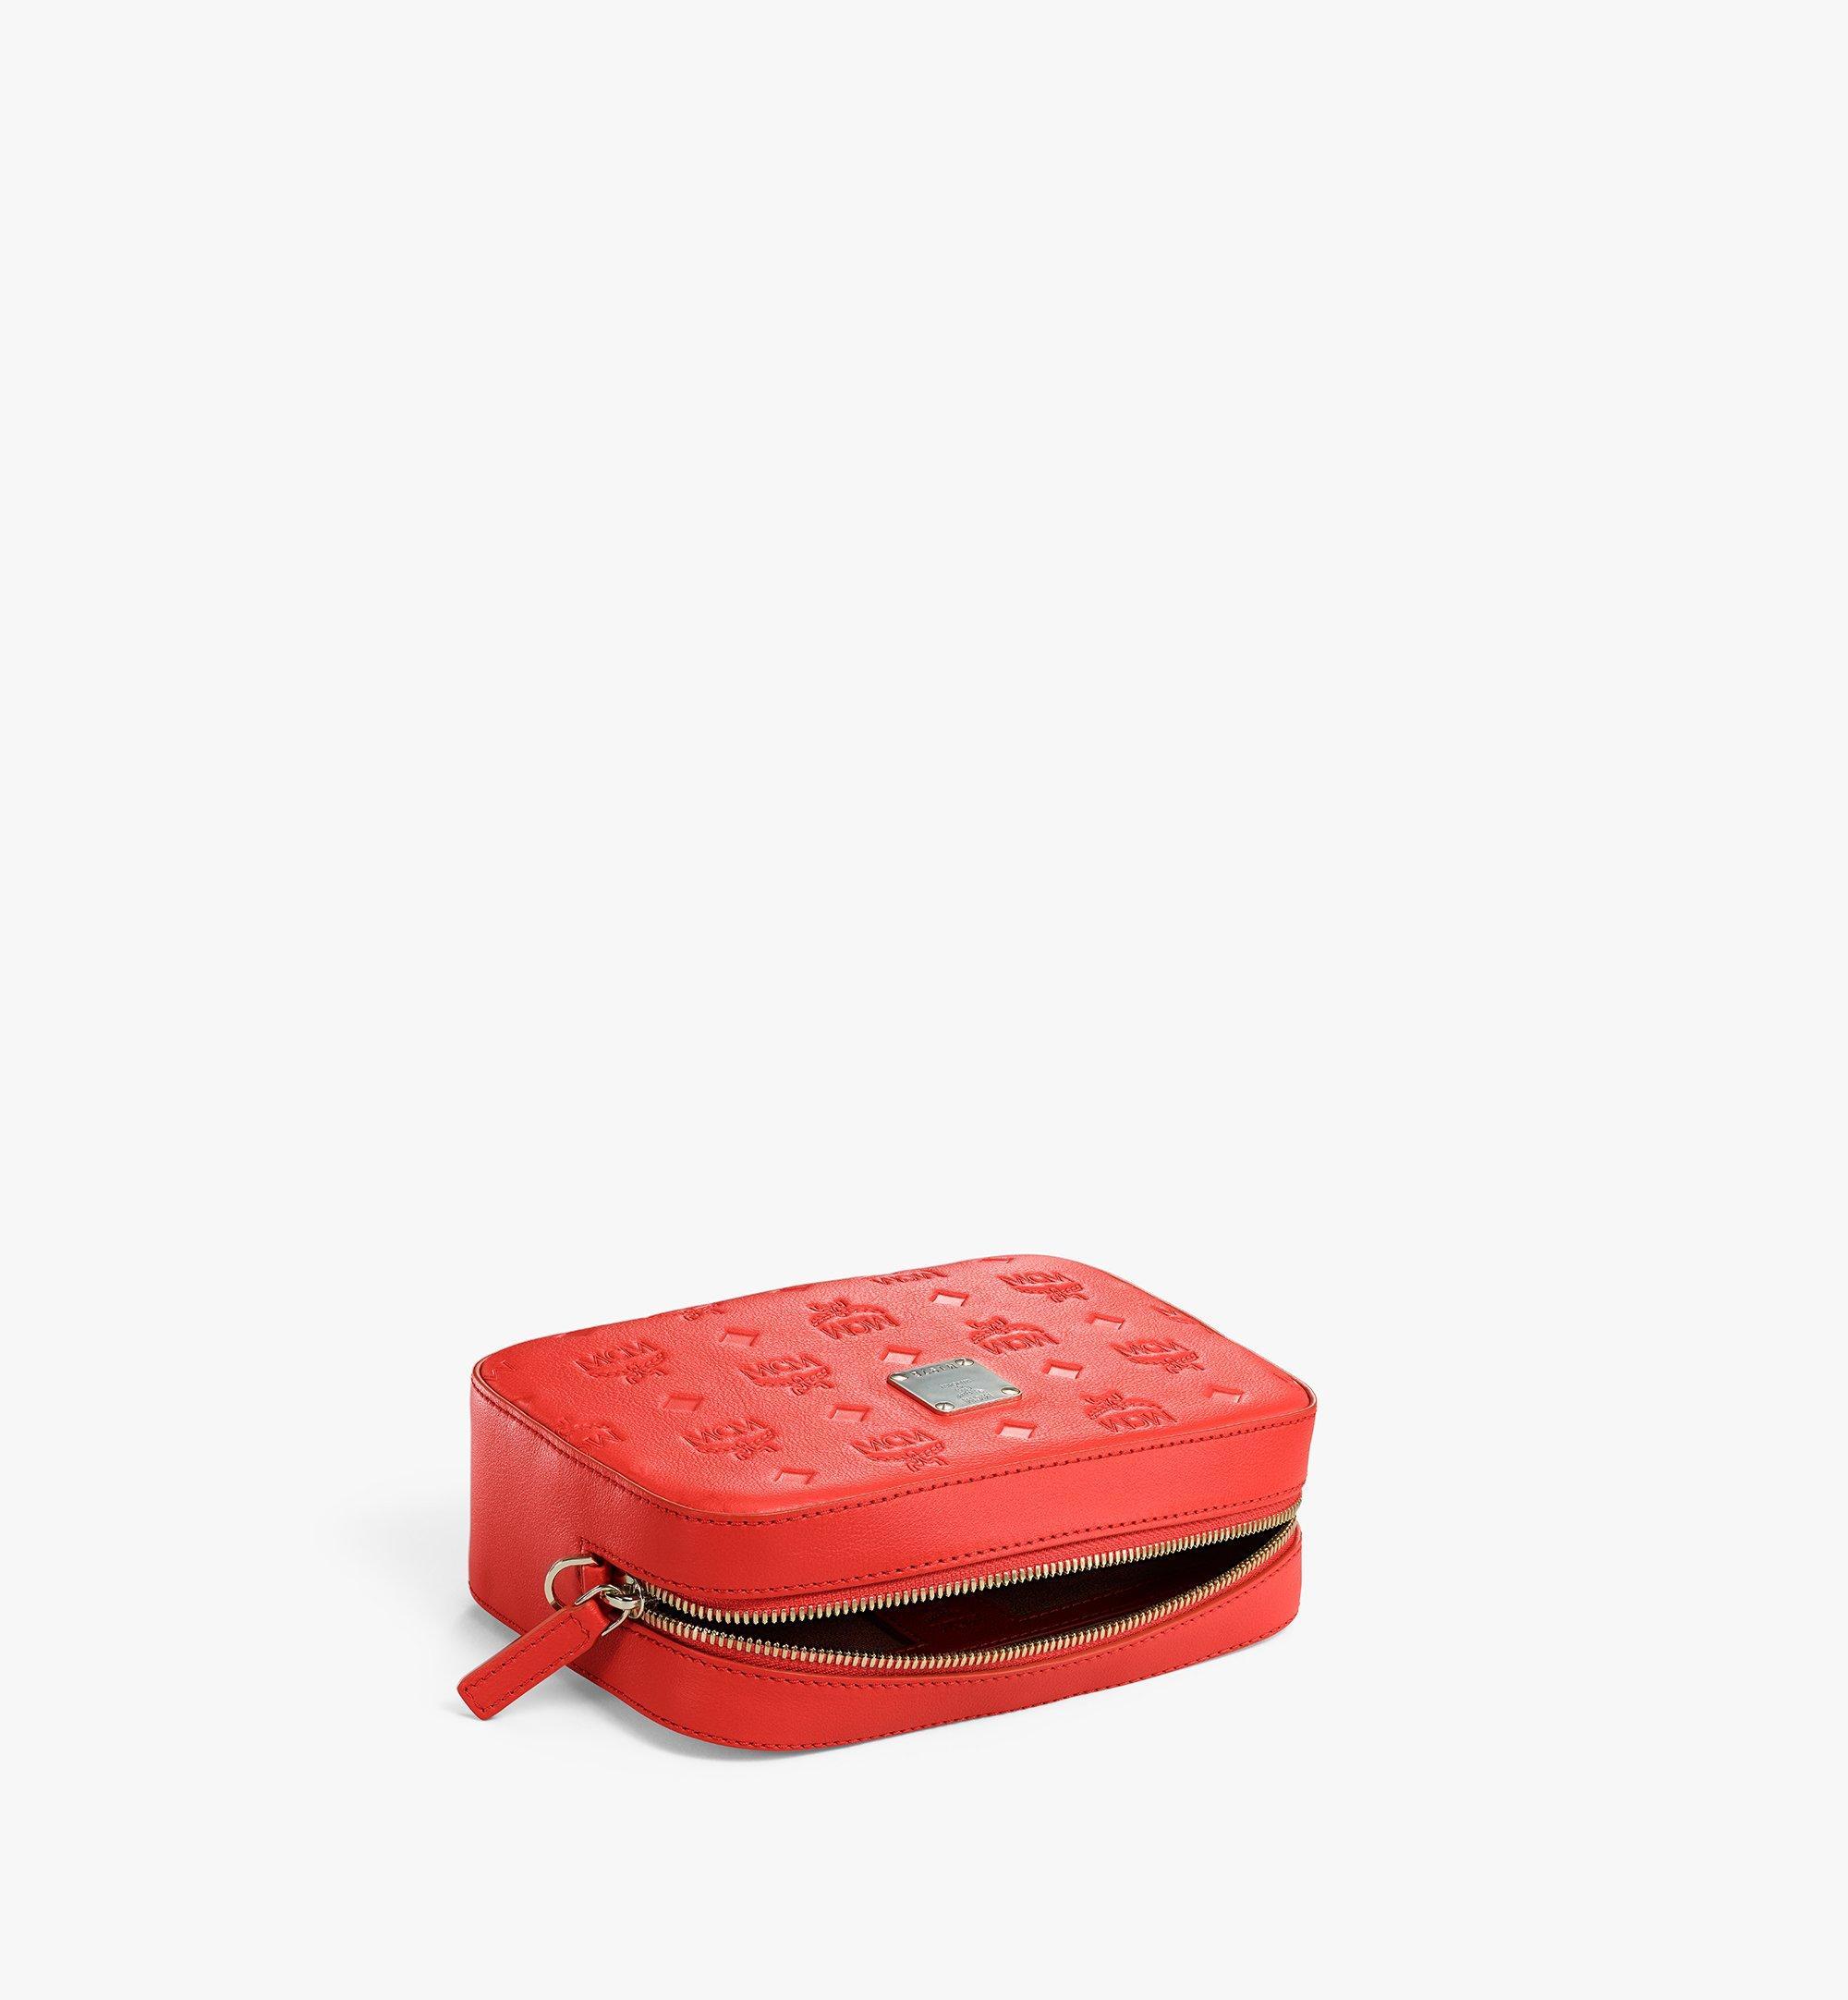 MCM Camera Bag in Monogram Leather Red MWRAAKM01R8001 Alternate View 2